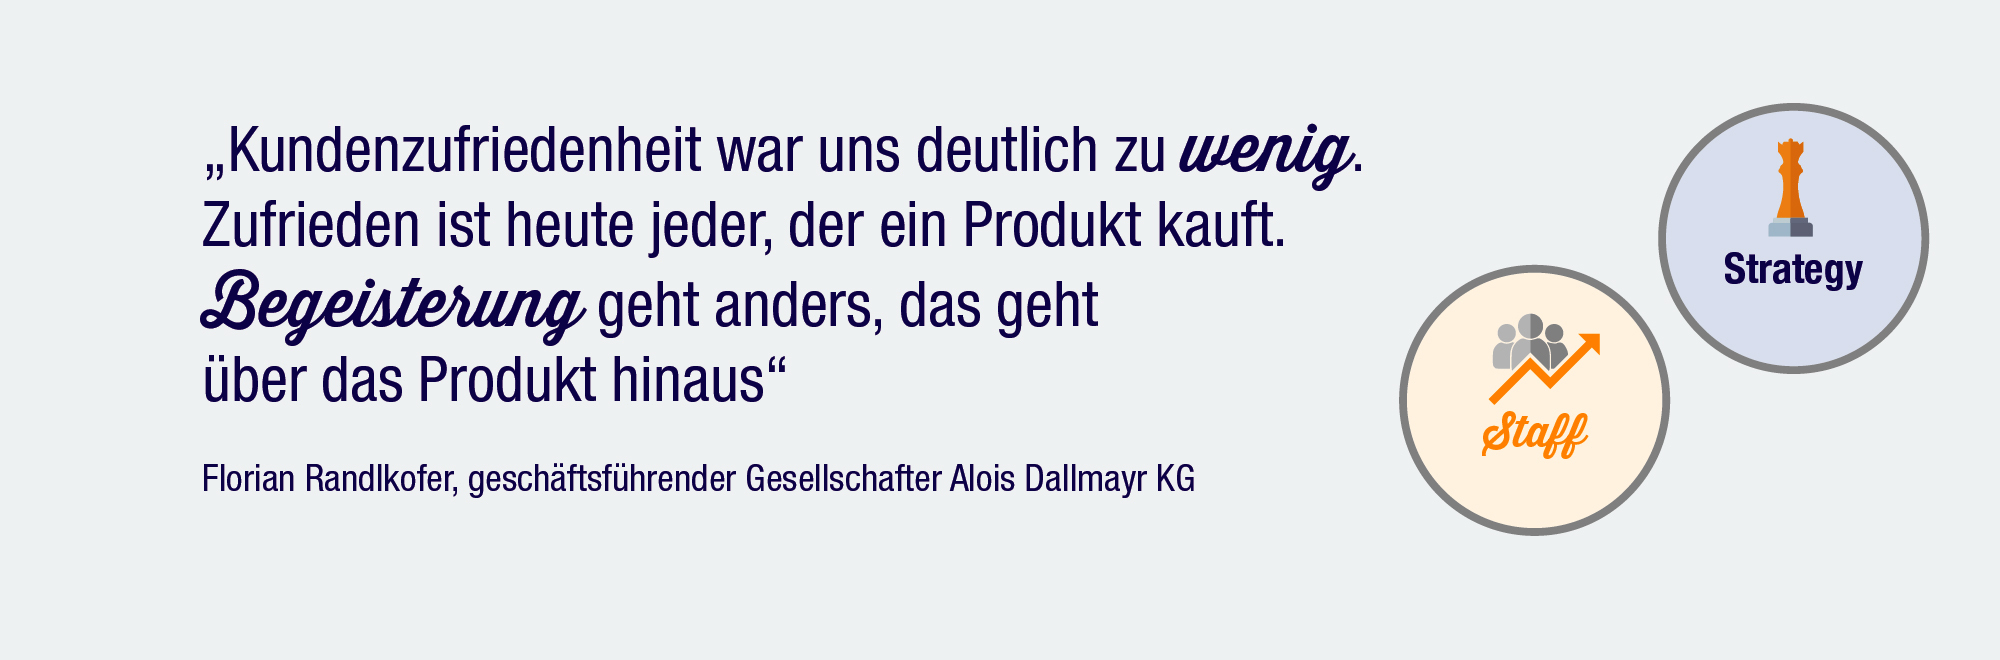 Jeden Tag einmalig - Alois Dallmayr KKG - Hutner AG